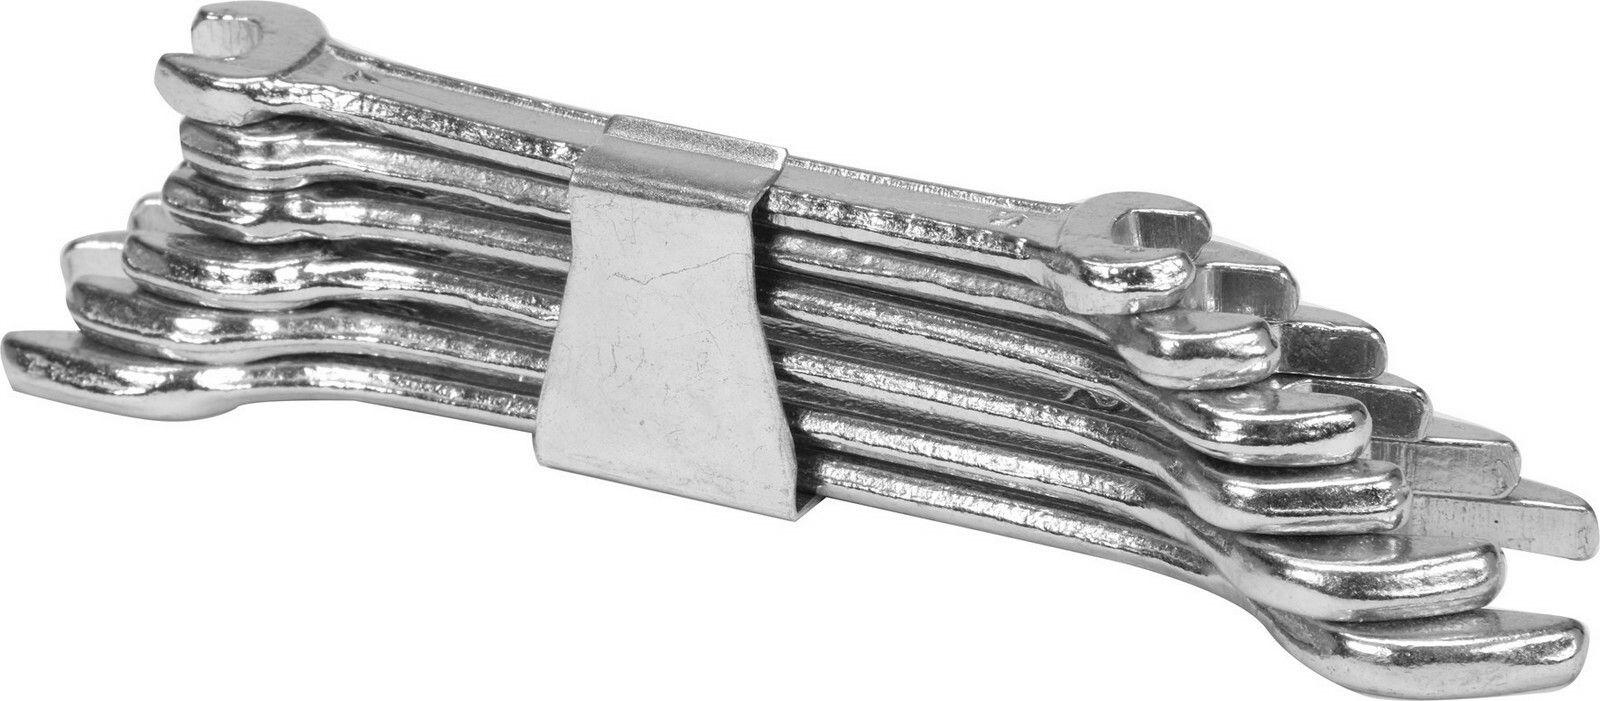 Sada klíčů plochých 6 ks 6 - 17 mm spona TOYA